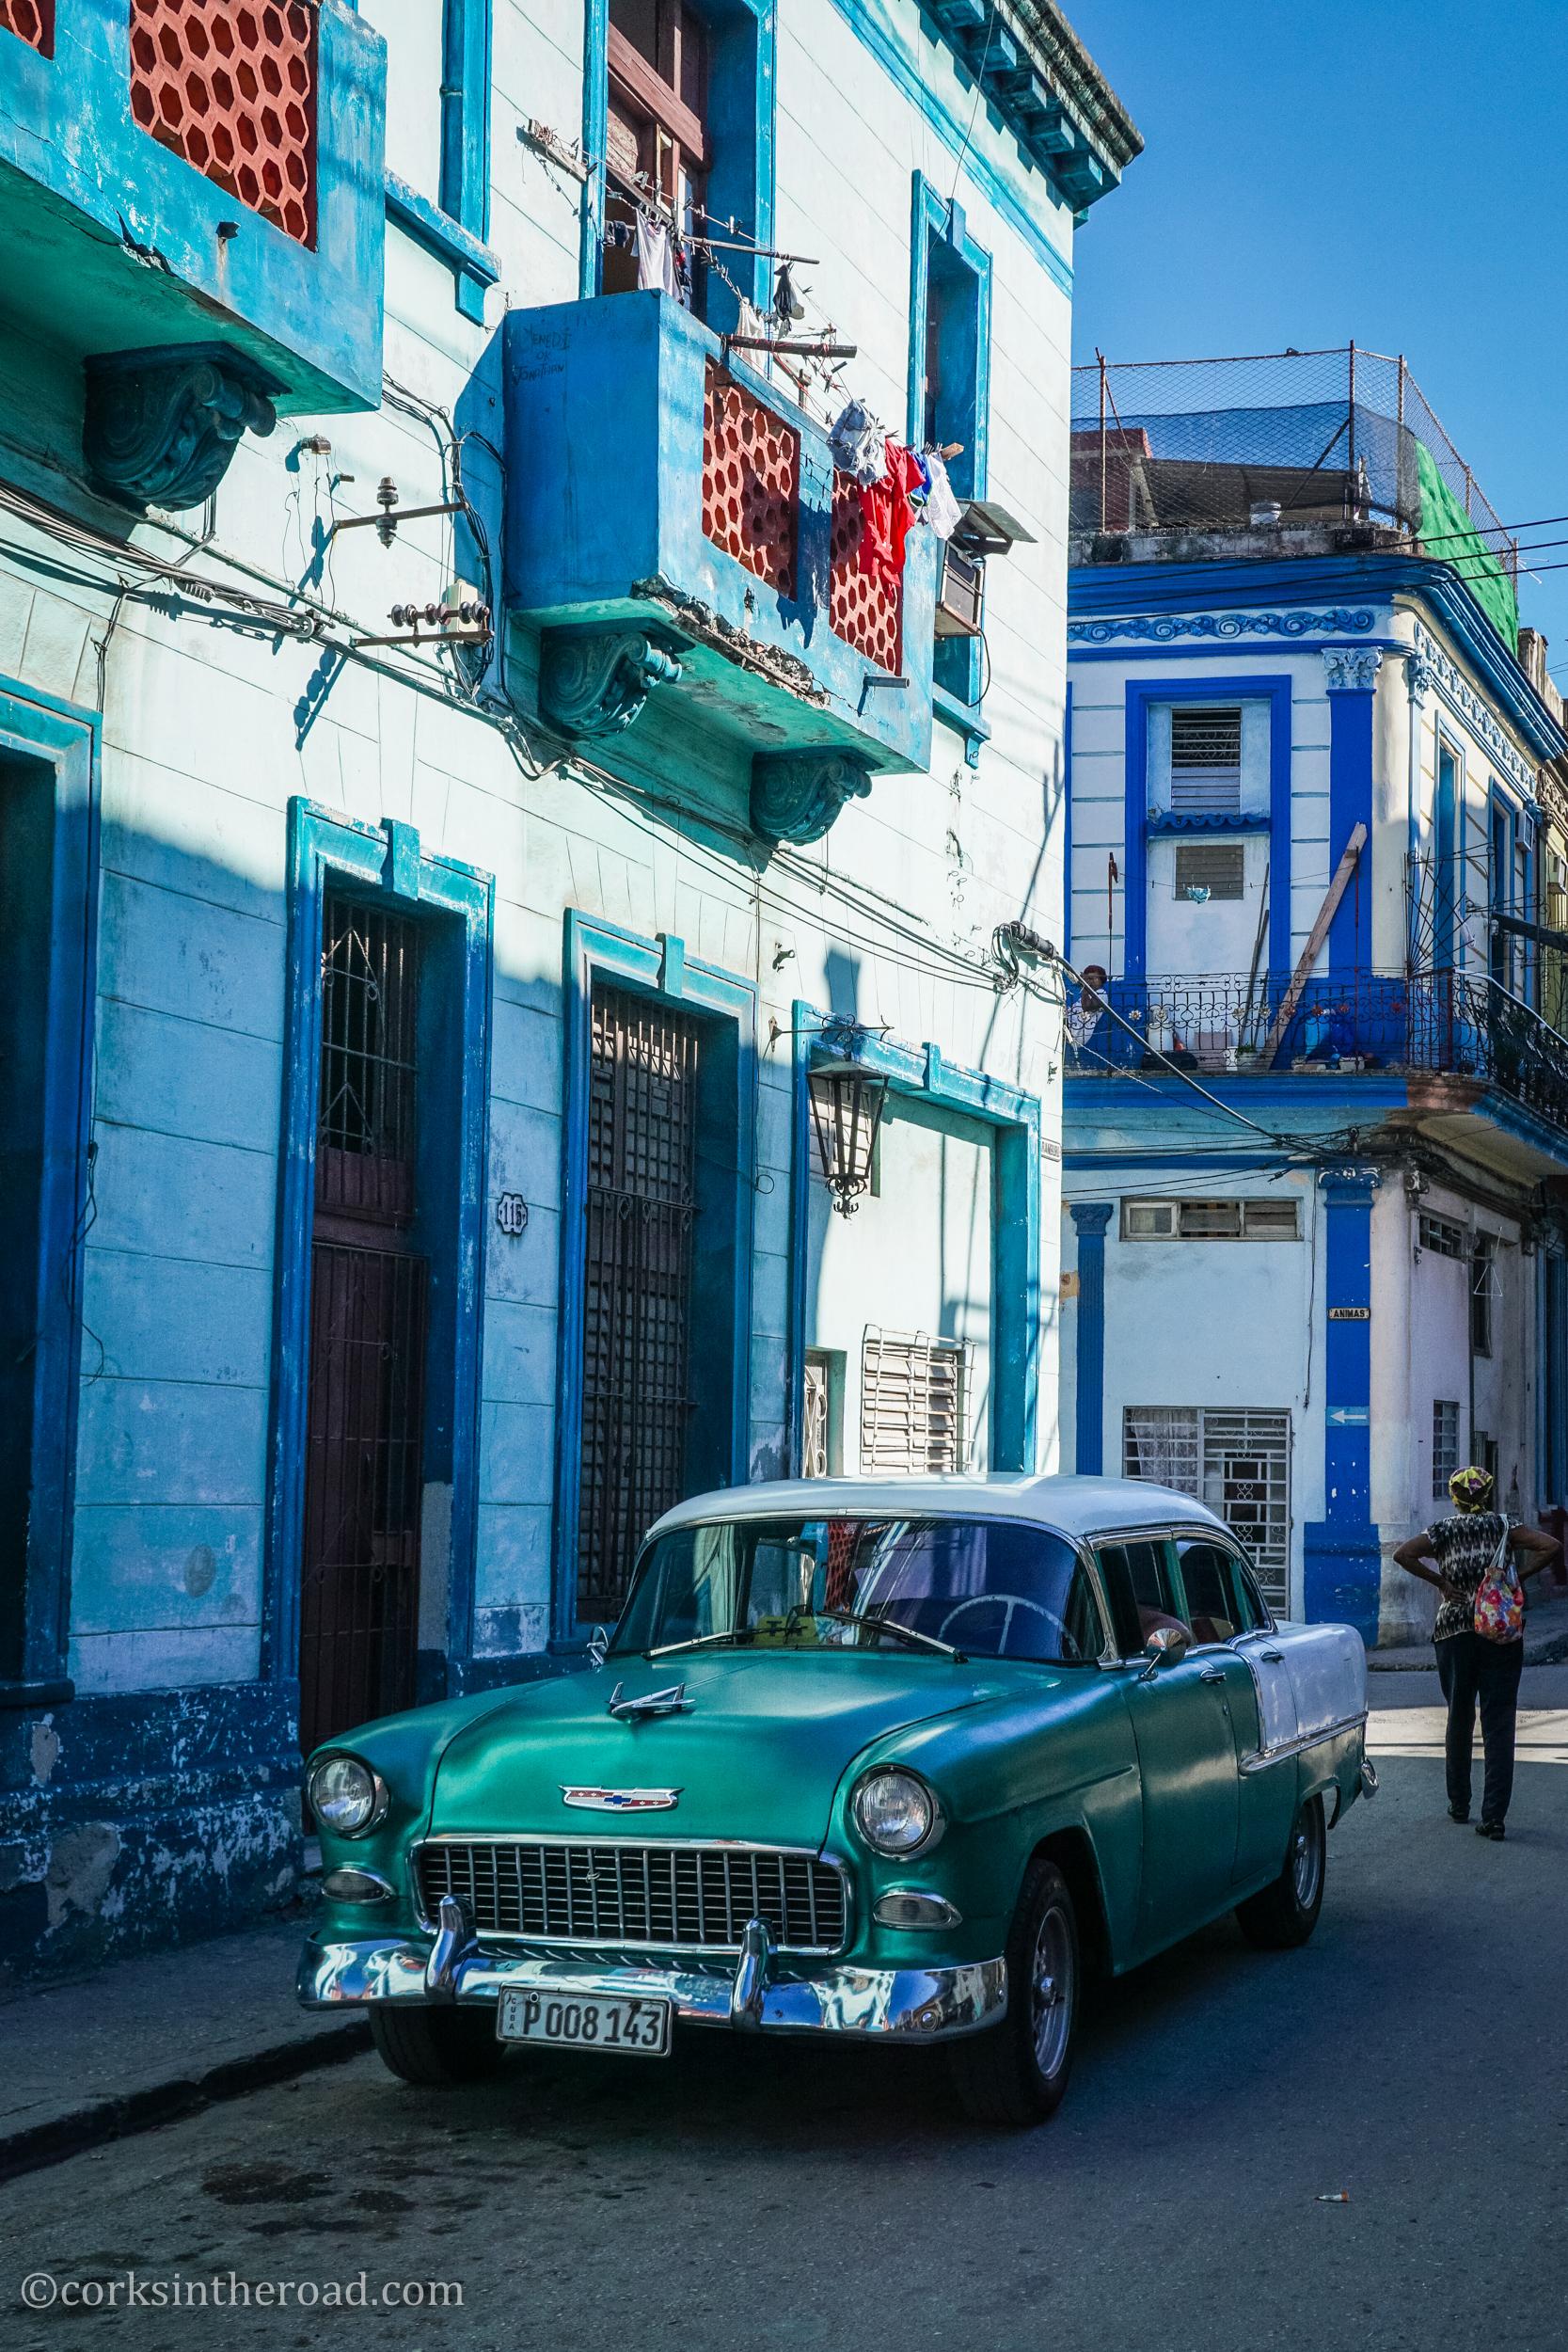 Architecture, Cars, Corksintheroad, Cuba, Havana.jpg